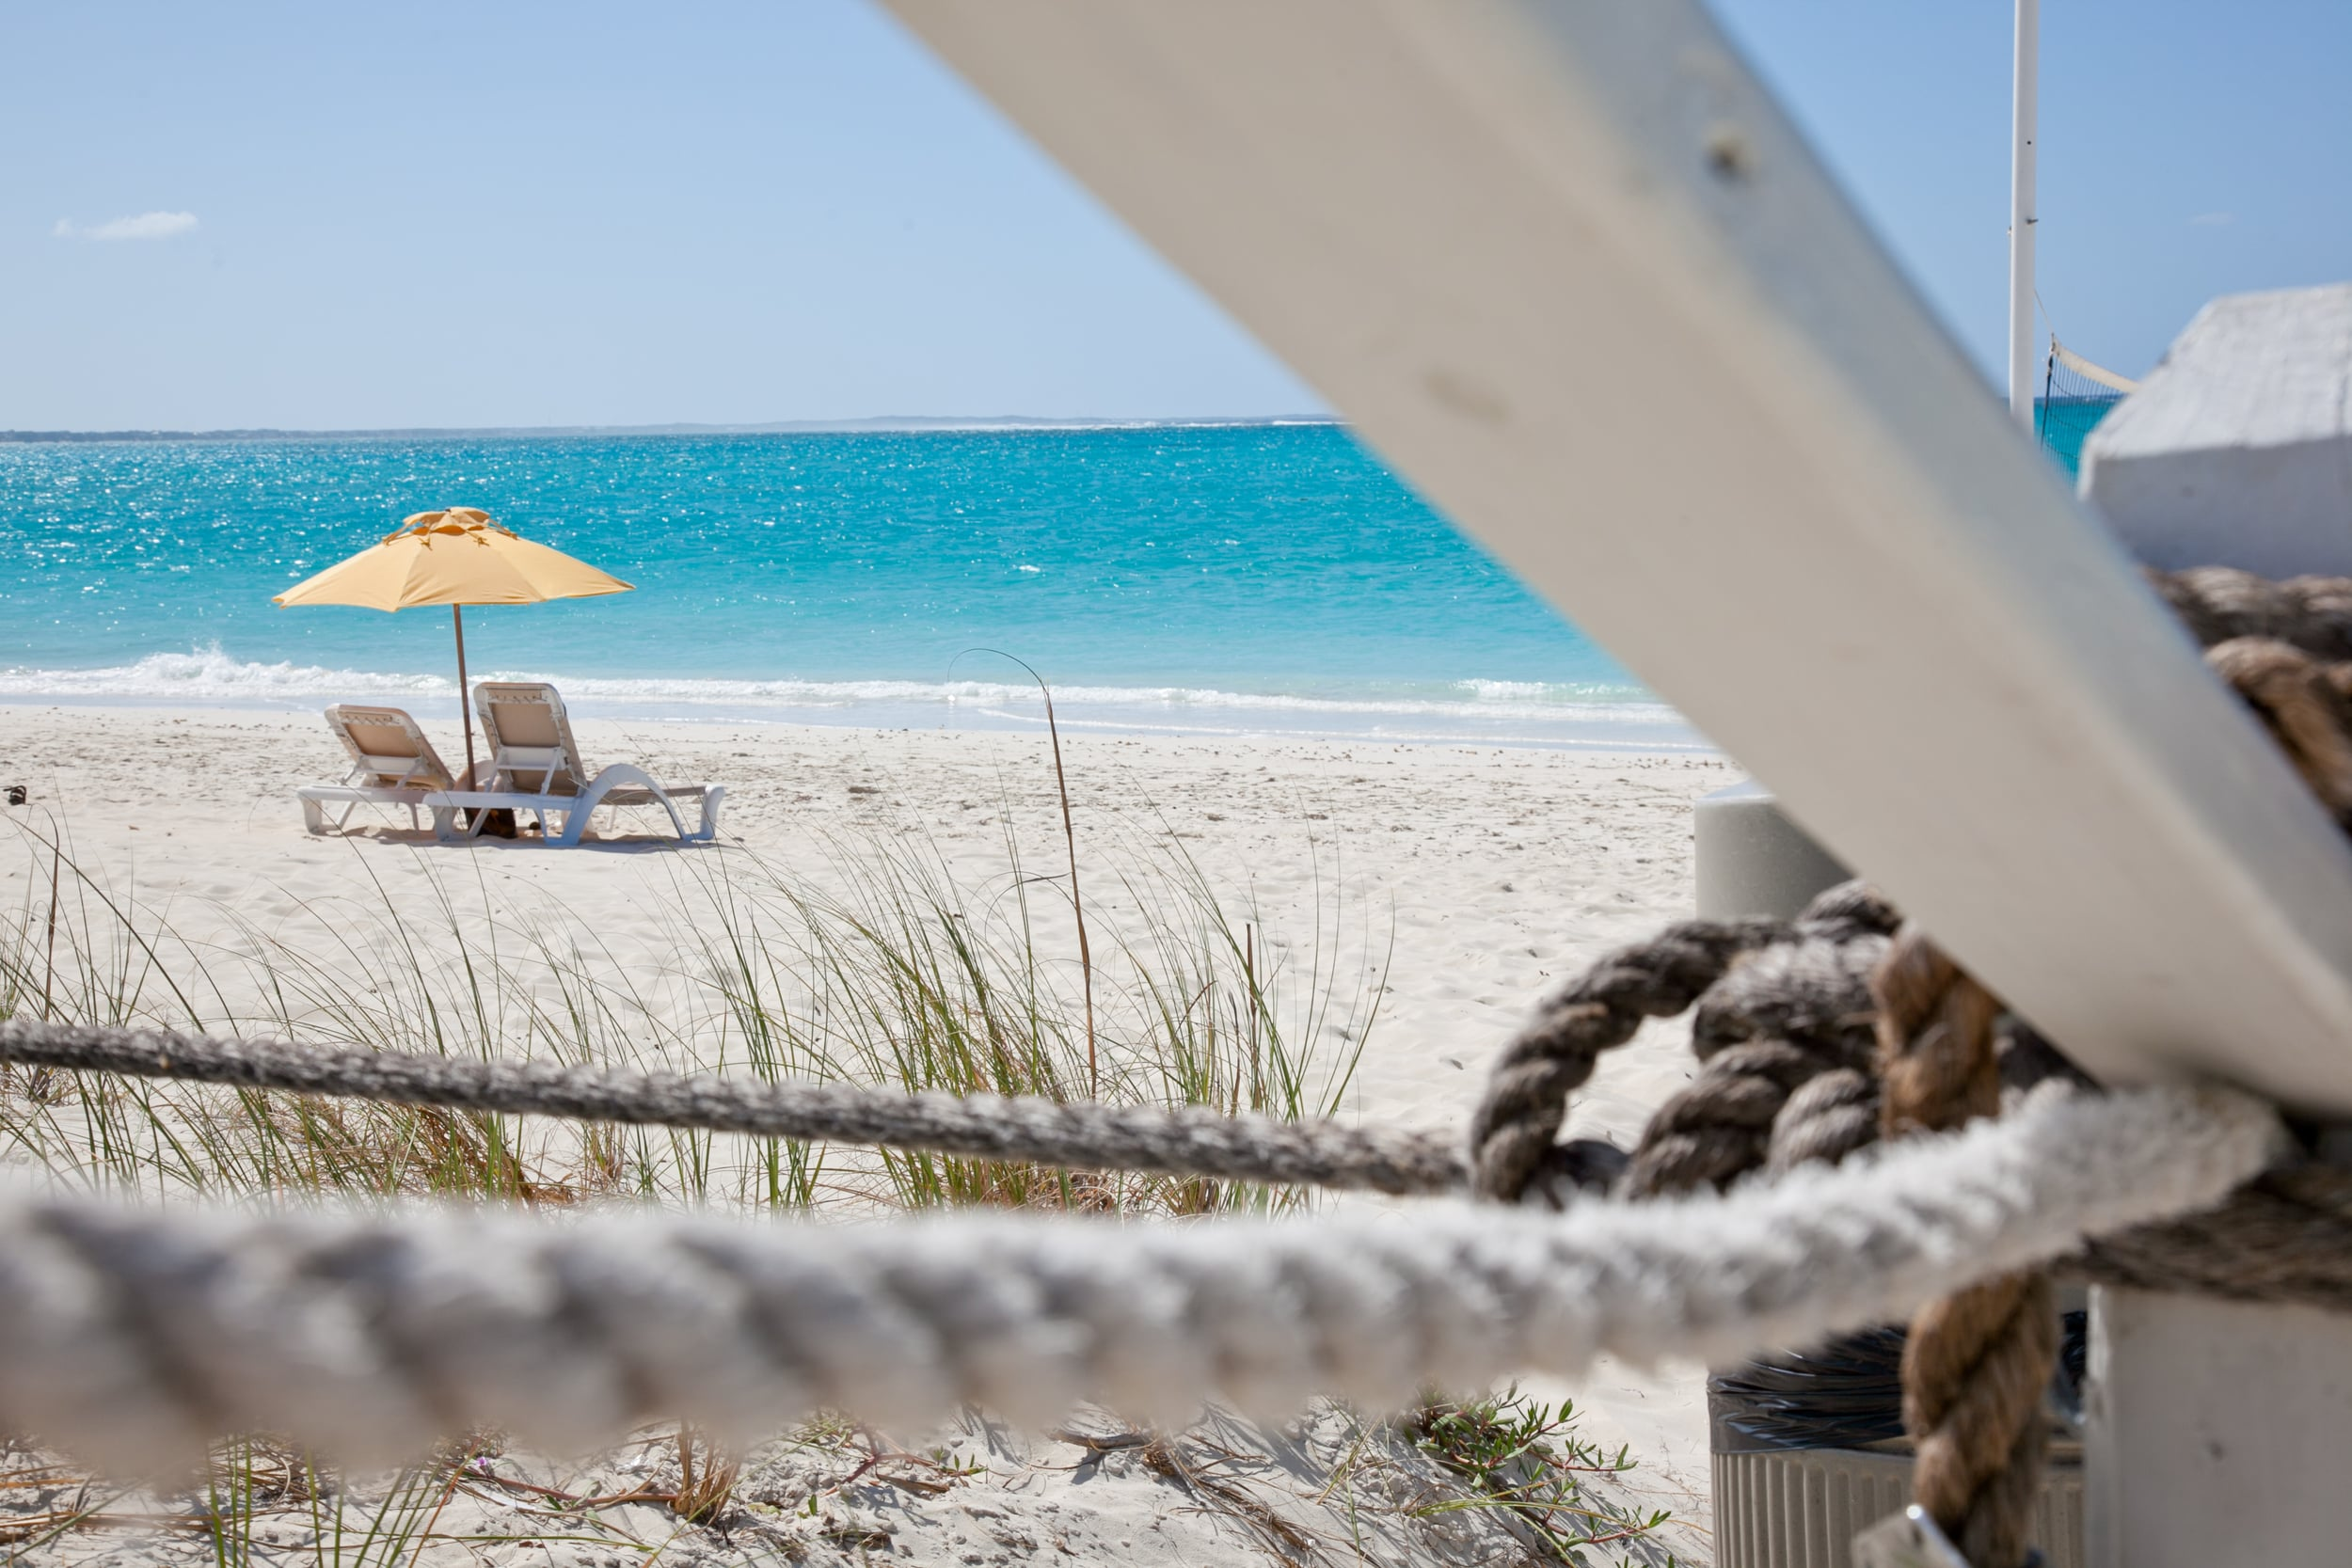 trisa-taro-beach-chairs-turks and caicos.jpg